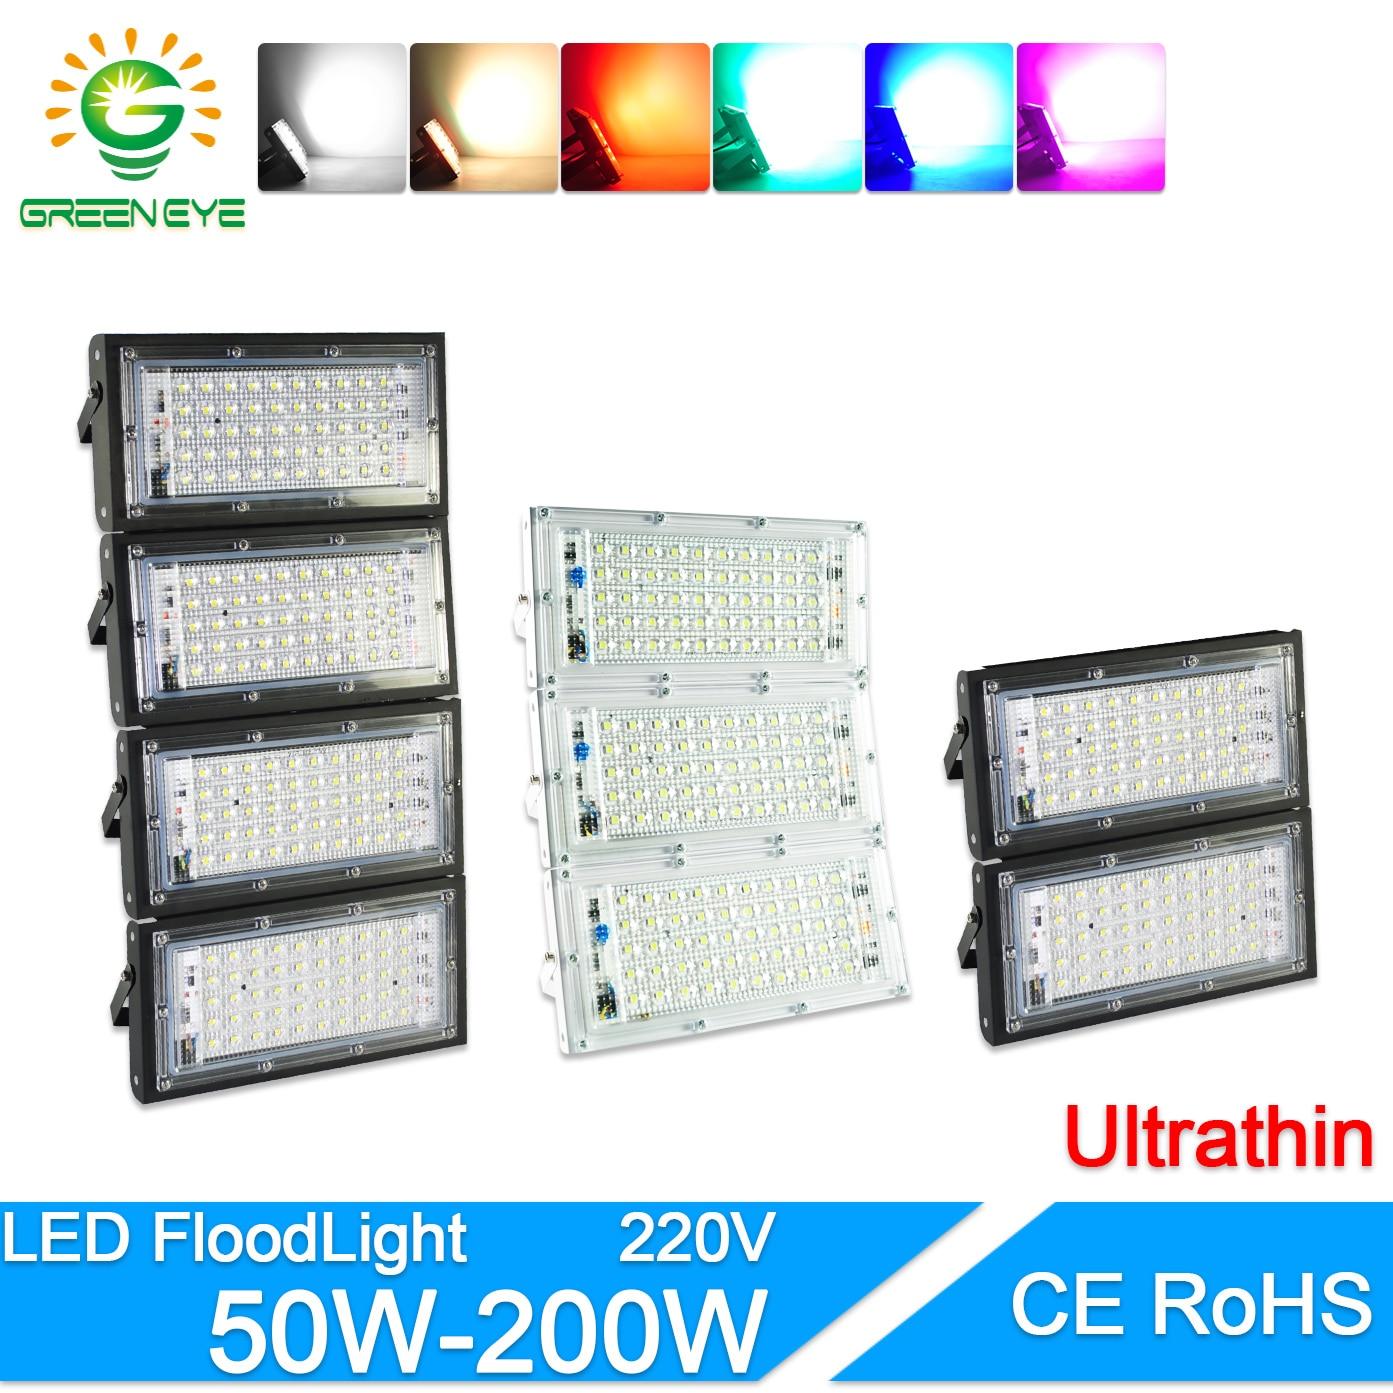 LED Flood Light 50W 100W 200W led Floodlight AC 220V 240V LED street Lamp waterproof IP65 outdoor Lighting led cob spotlight